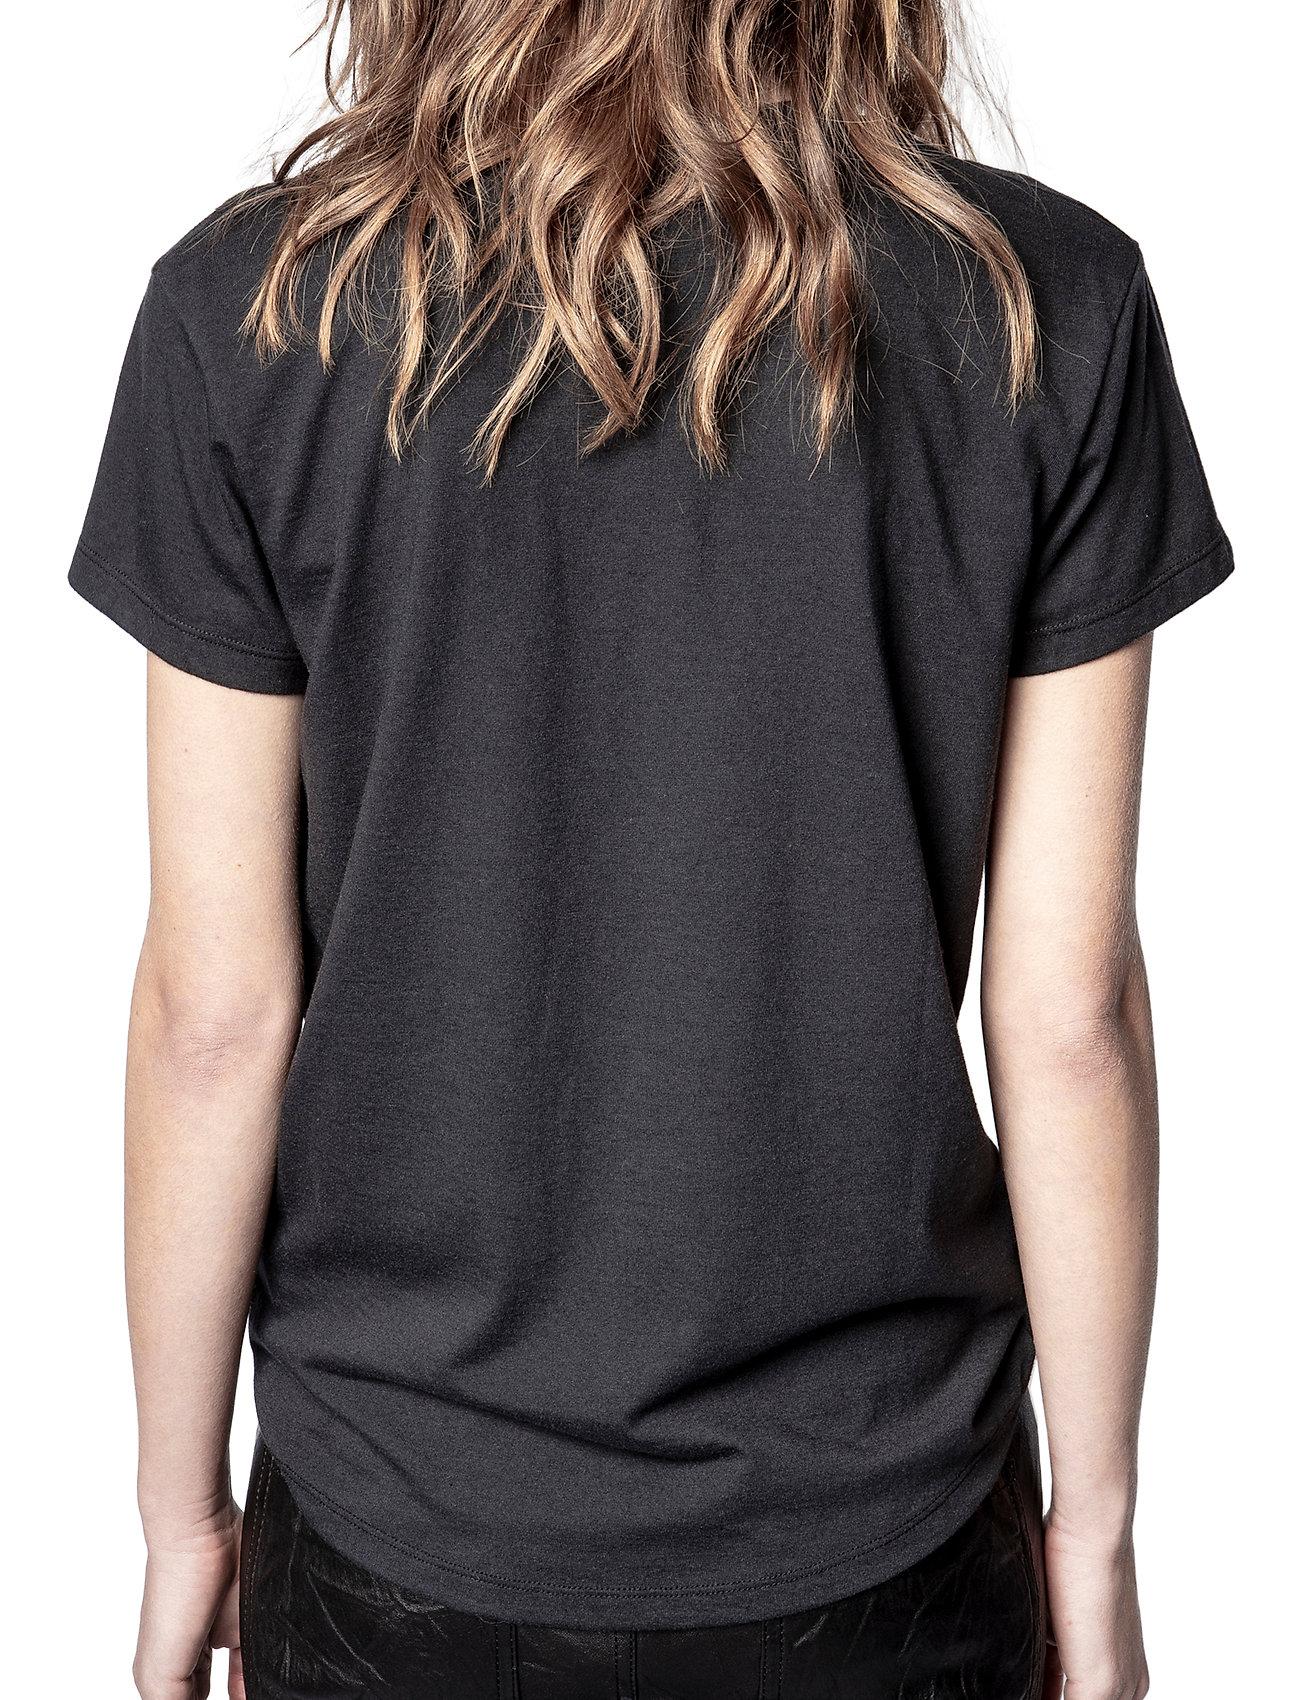 Zadig & Voltaire - ZOE SMALL HEART ICONICS T-SHIRT - t-shirts - black - 4